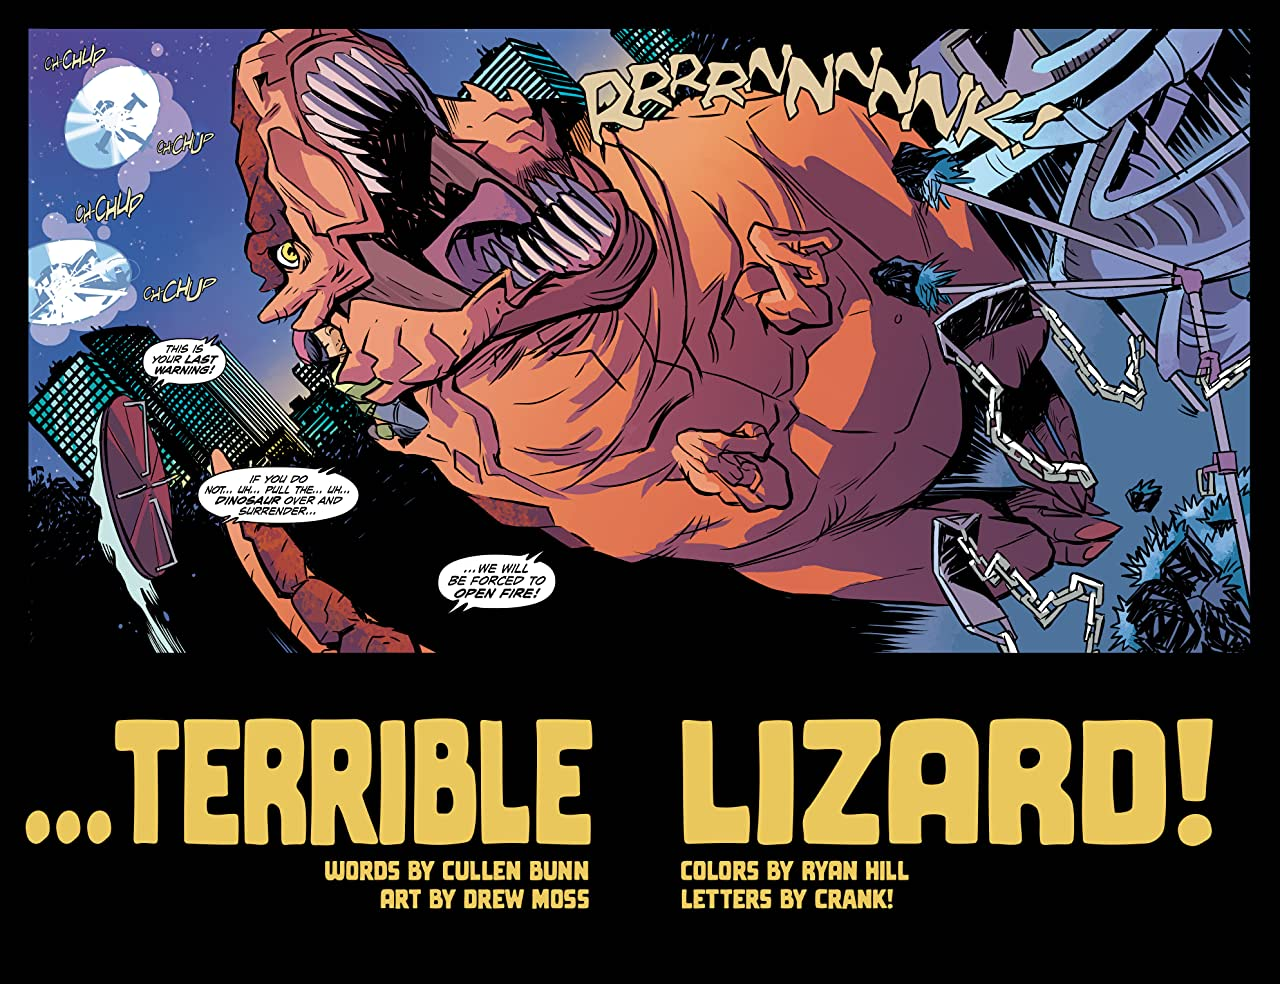 Terrible Lizard #3 (of 5)